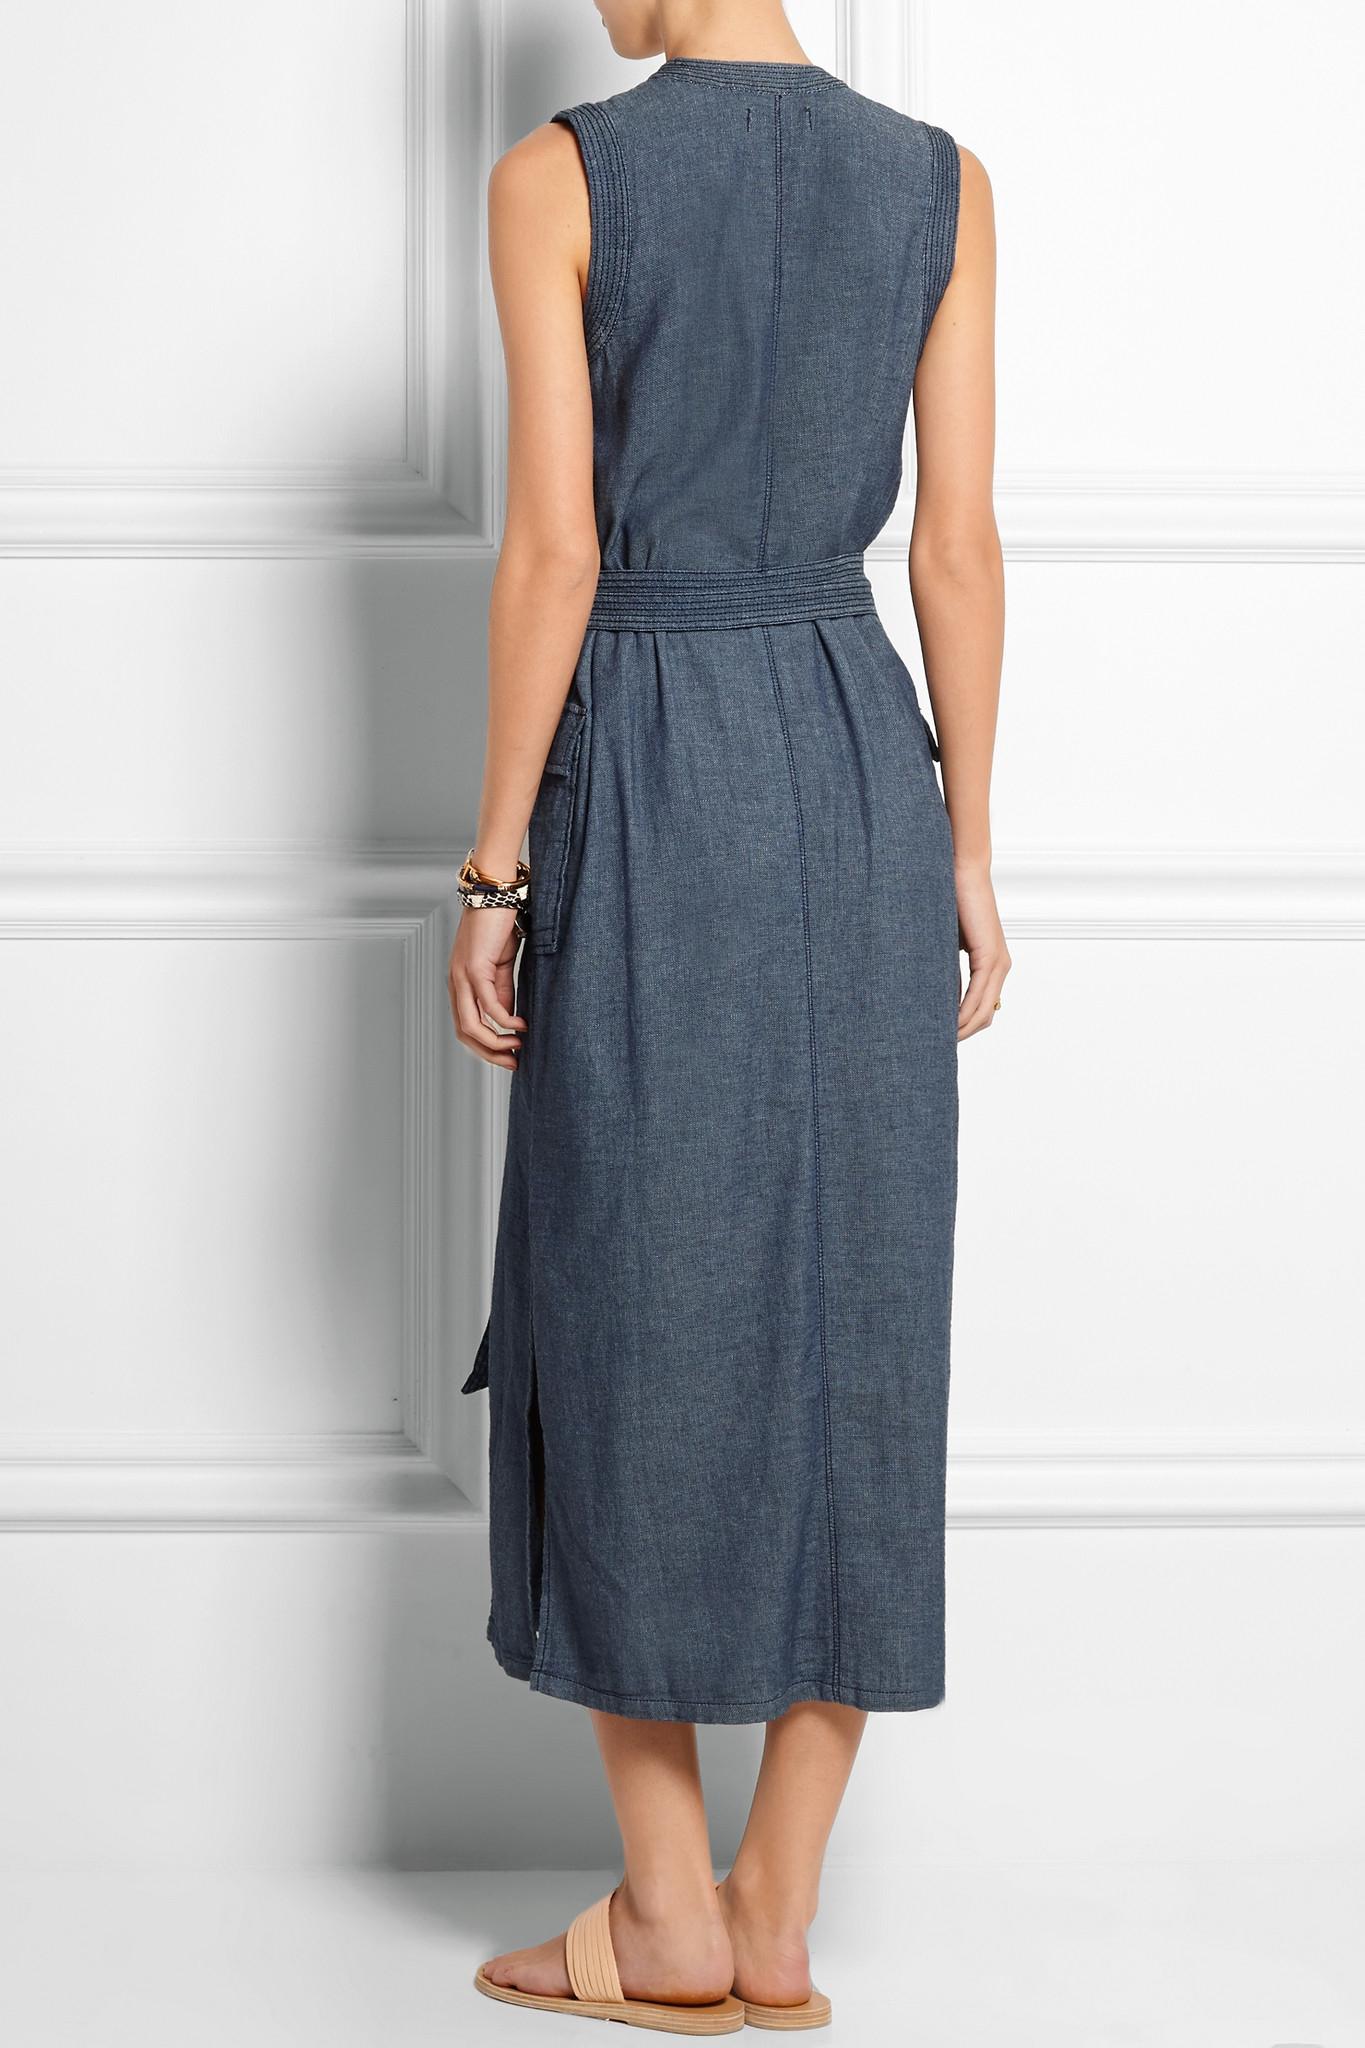 9e43362706 Madewell Denim Wrap Dress in Blue - Lyst